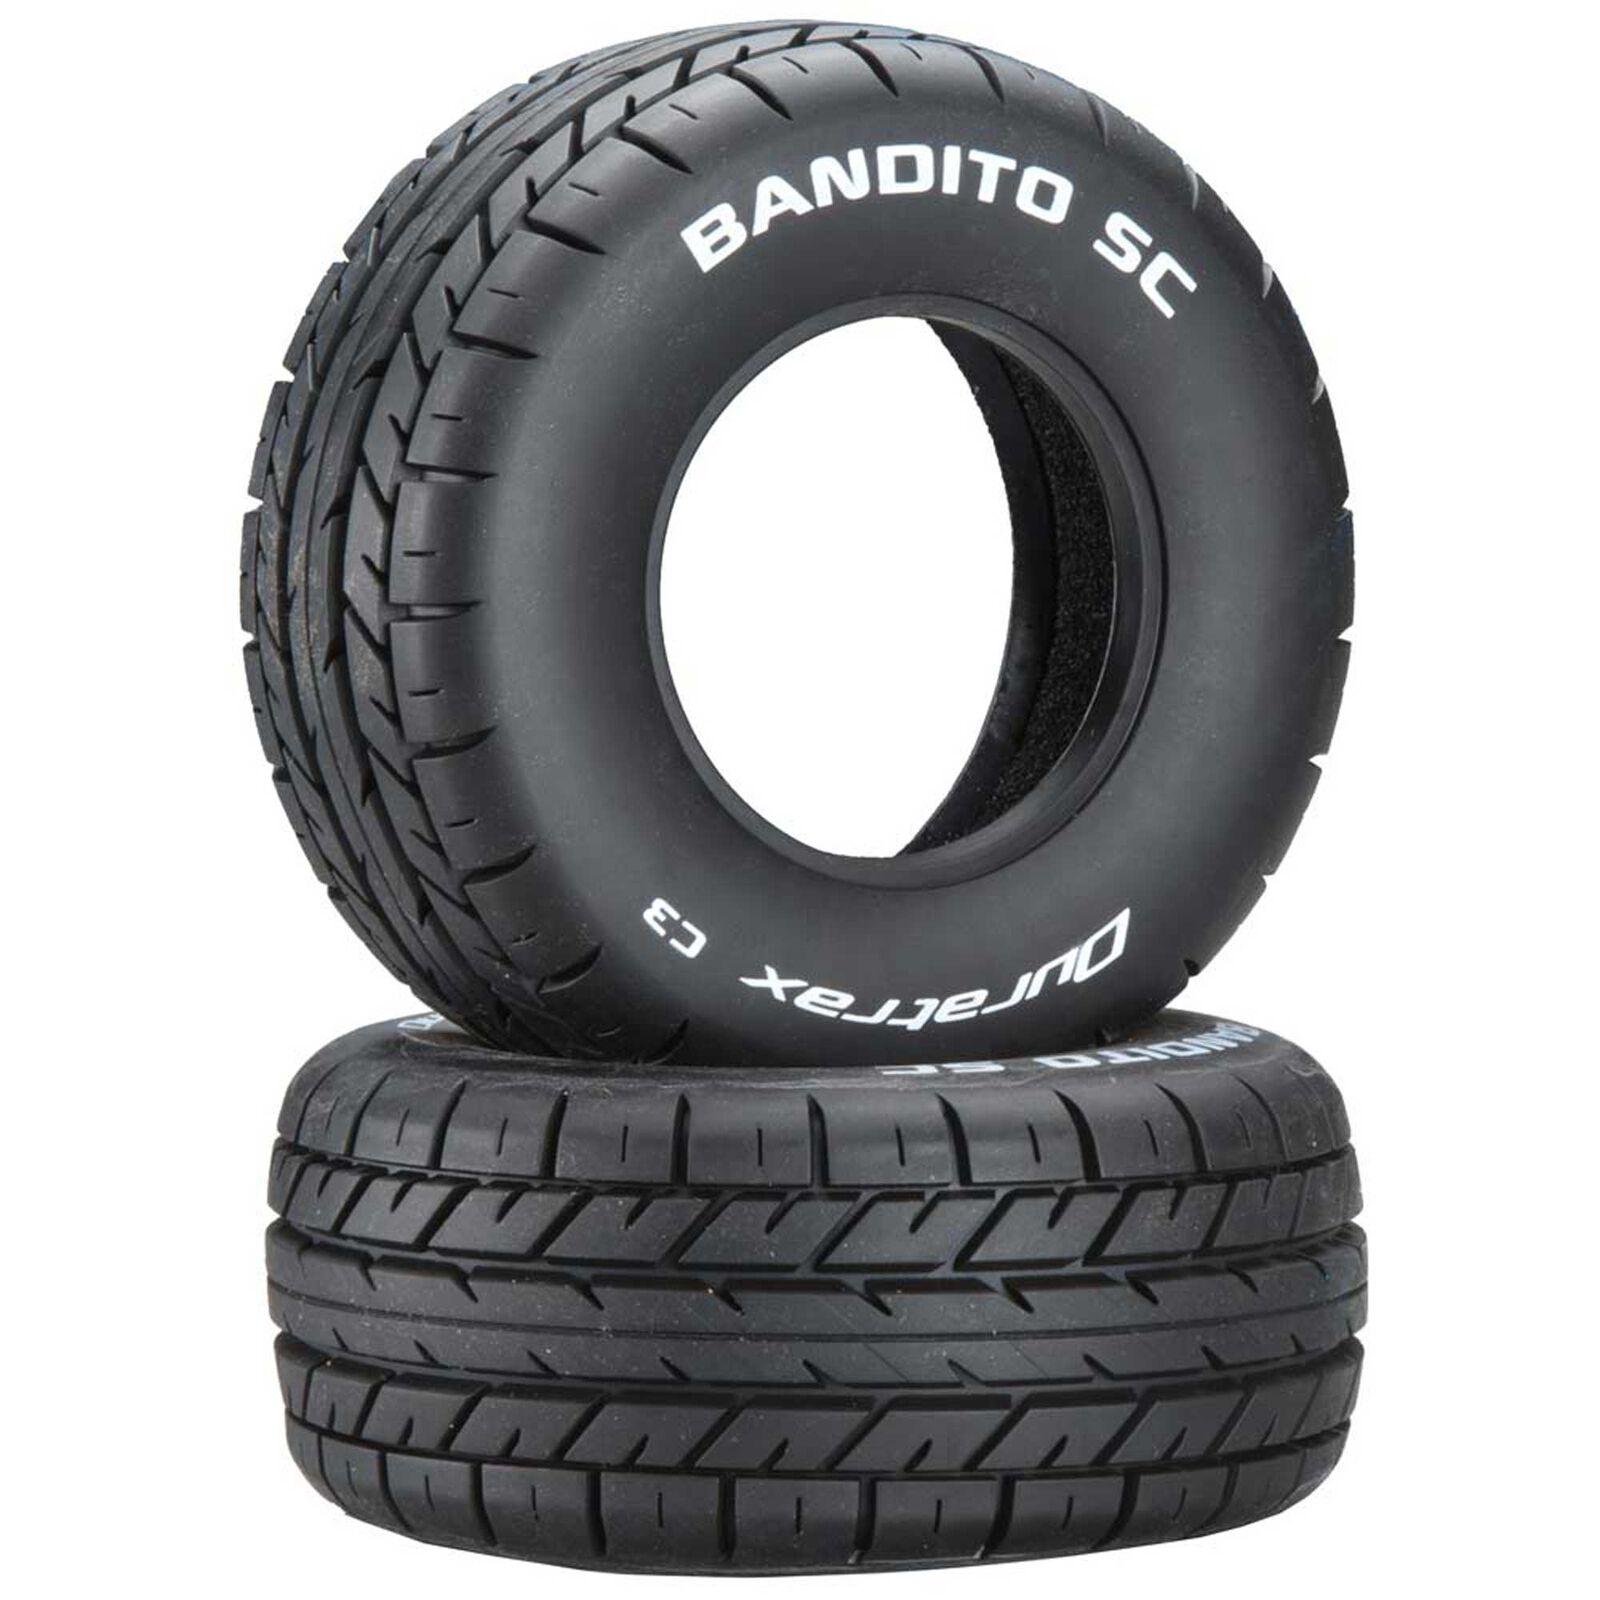 Bandito SC On-Road Tires C3 (2)